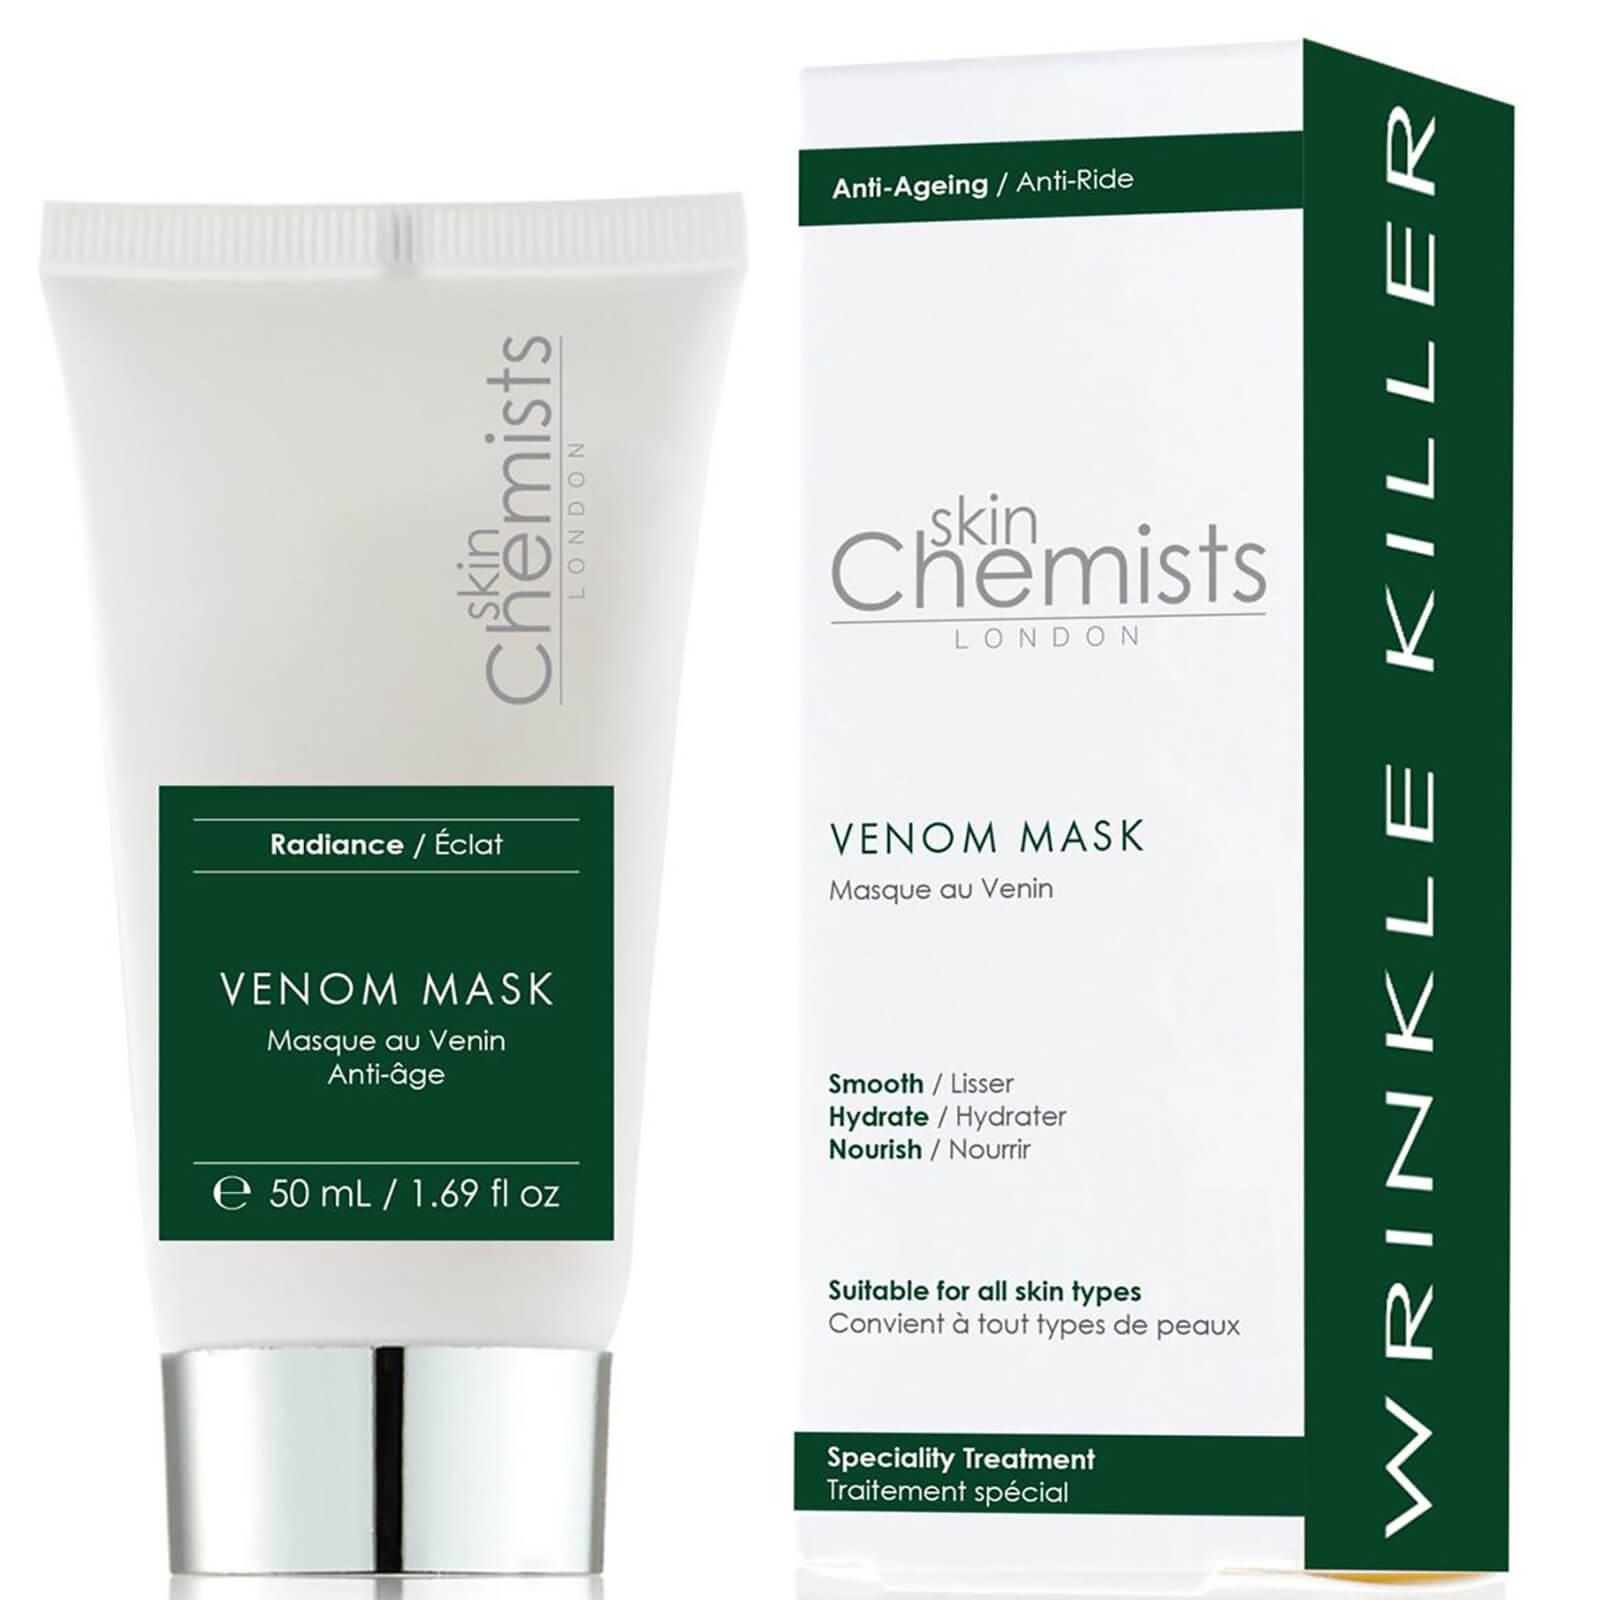 Skin Chemists Anti-Ageing Venom Mask